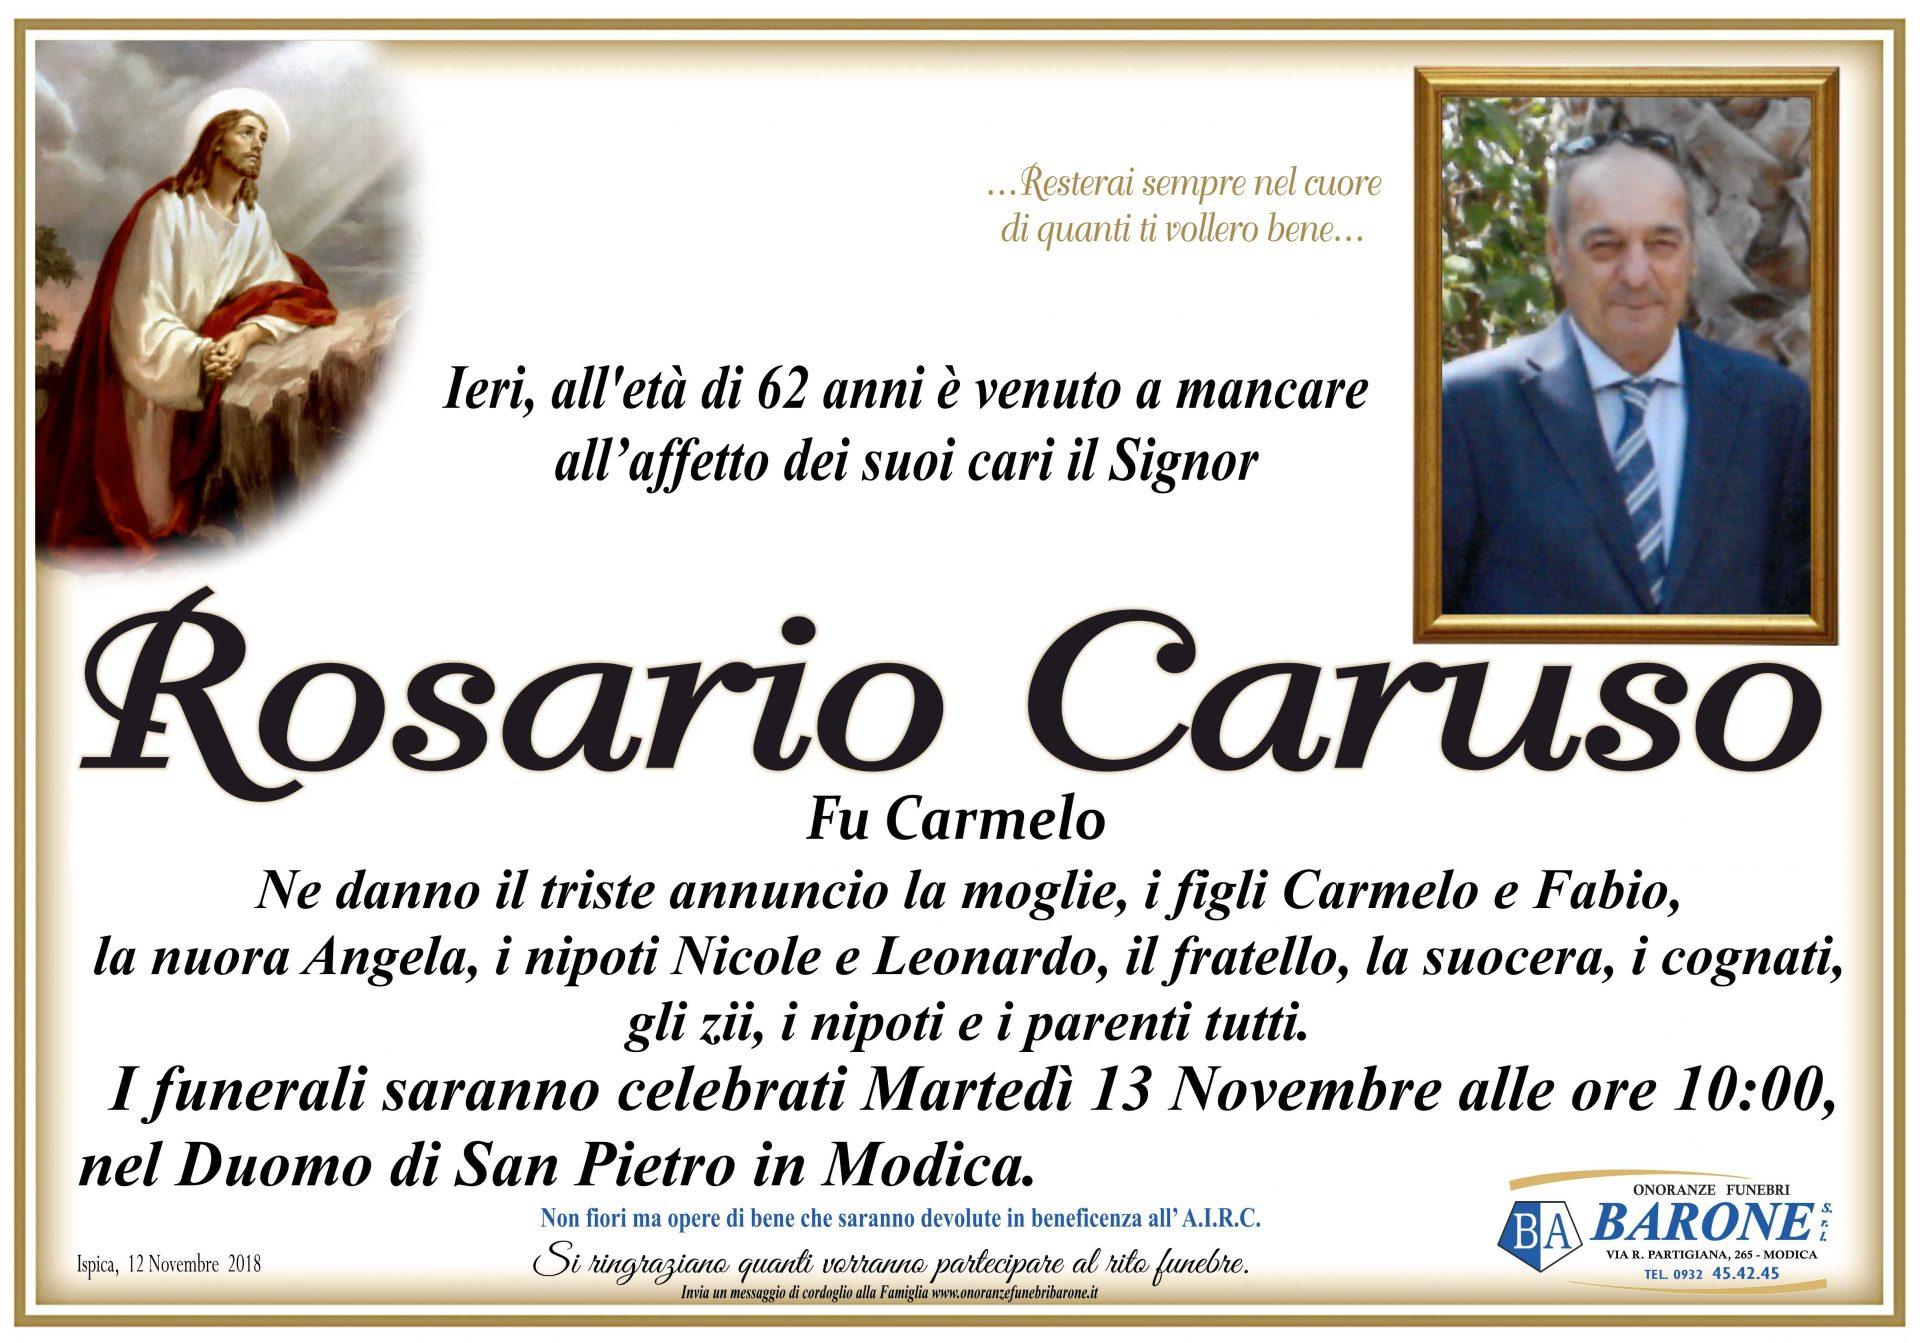 Rosario Caruso